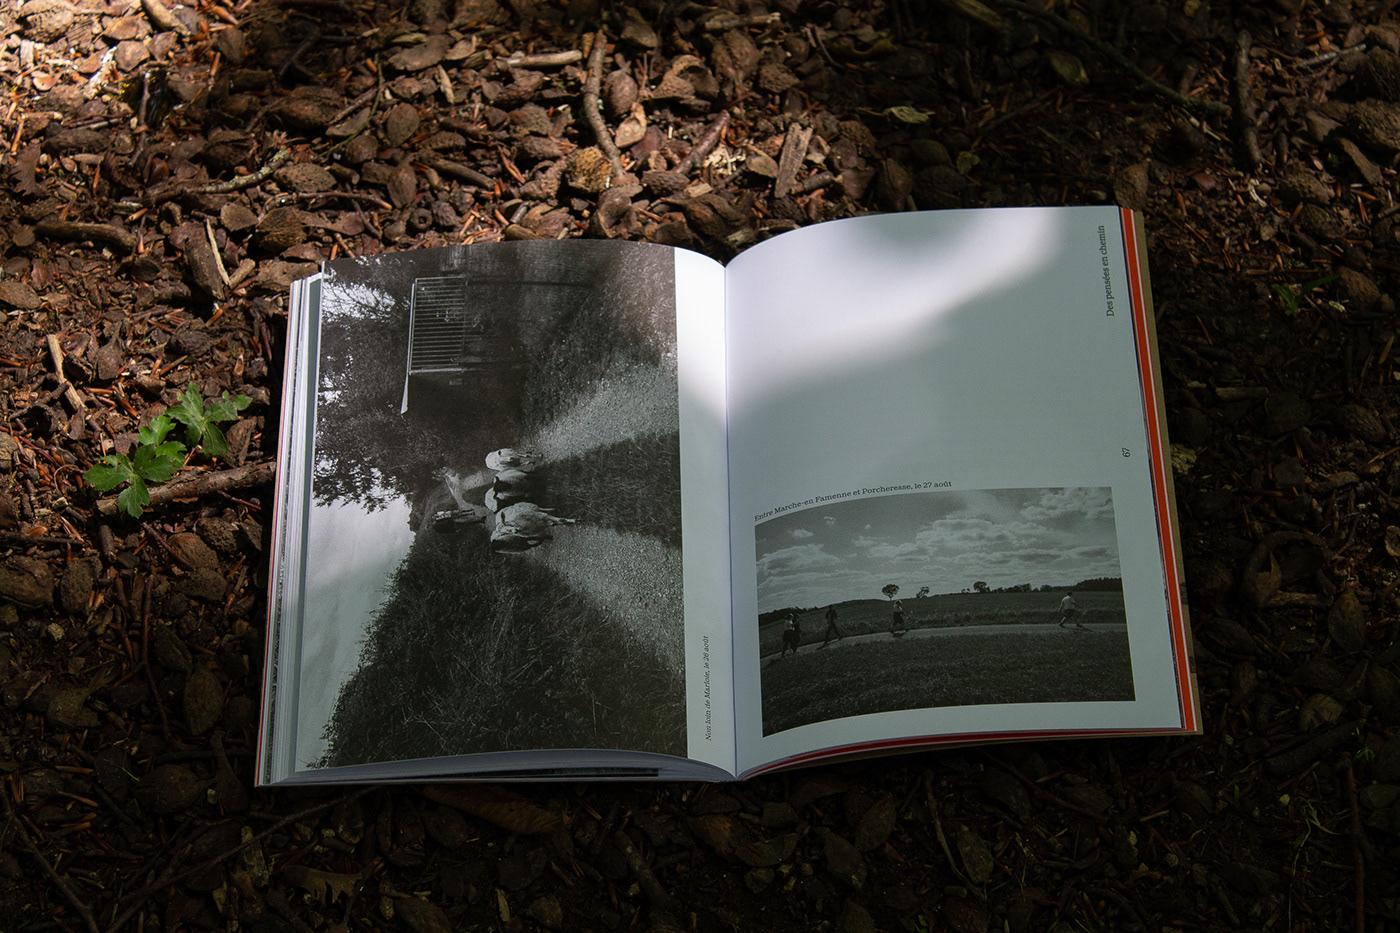 arts blackandwhite book cultural edition Kraft nomad Philosophic road walking